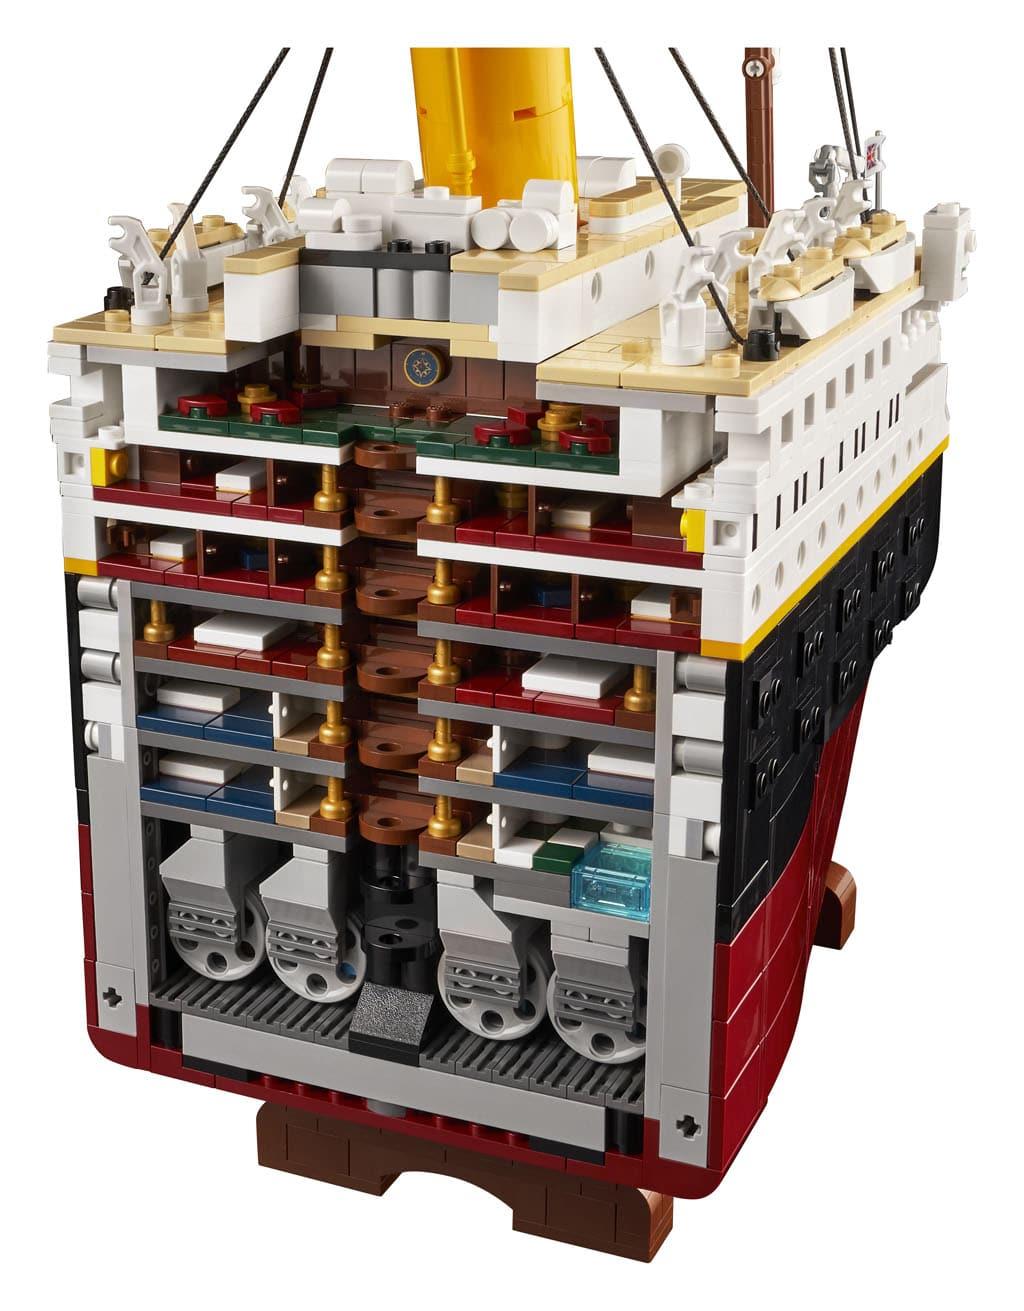 LEGO Titanic 10294 16